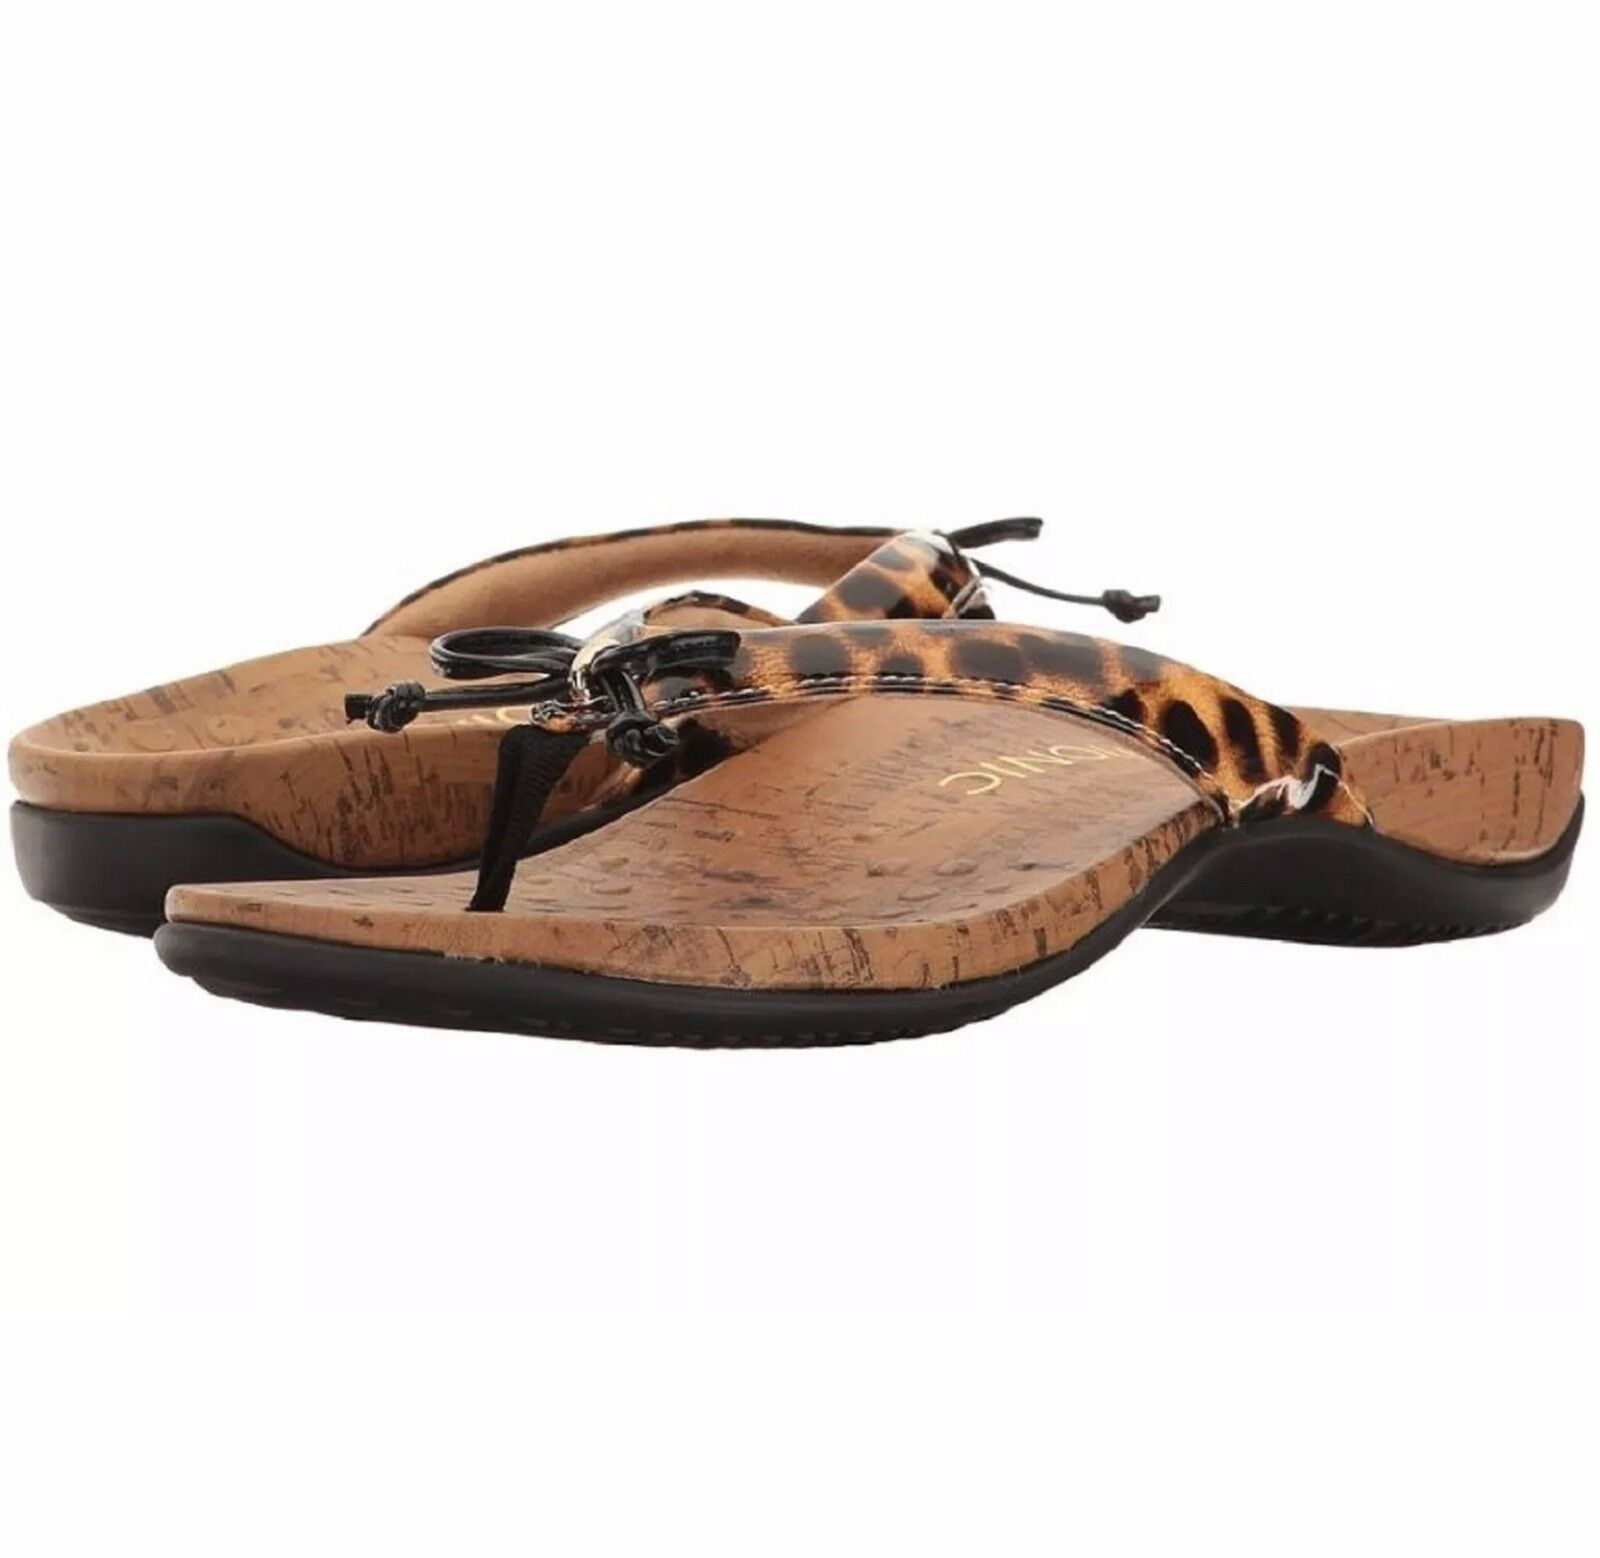 Vionic W Orthaheel REST CASSIE Thong Sandals W Bow Detail LEOPARD PRINT 7W NIB